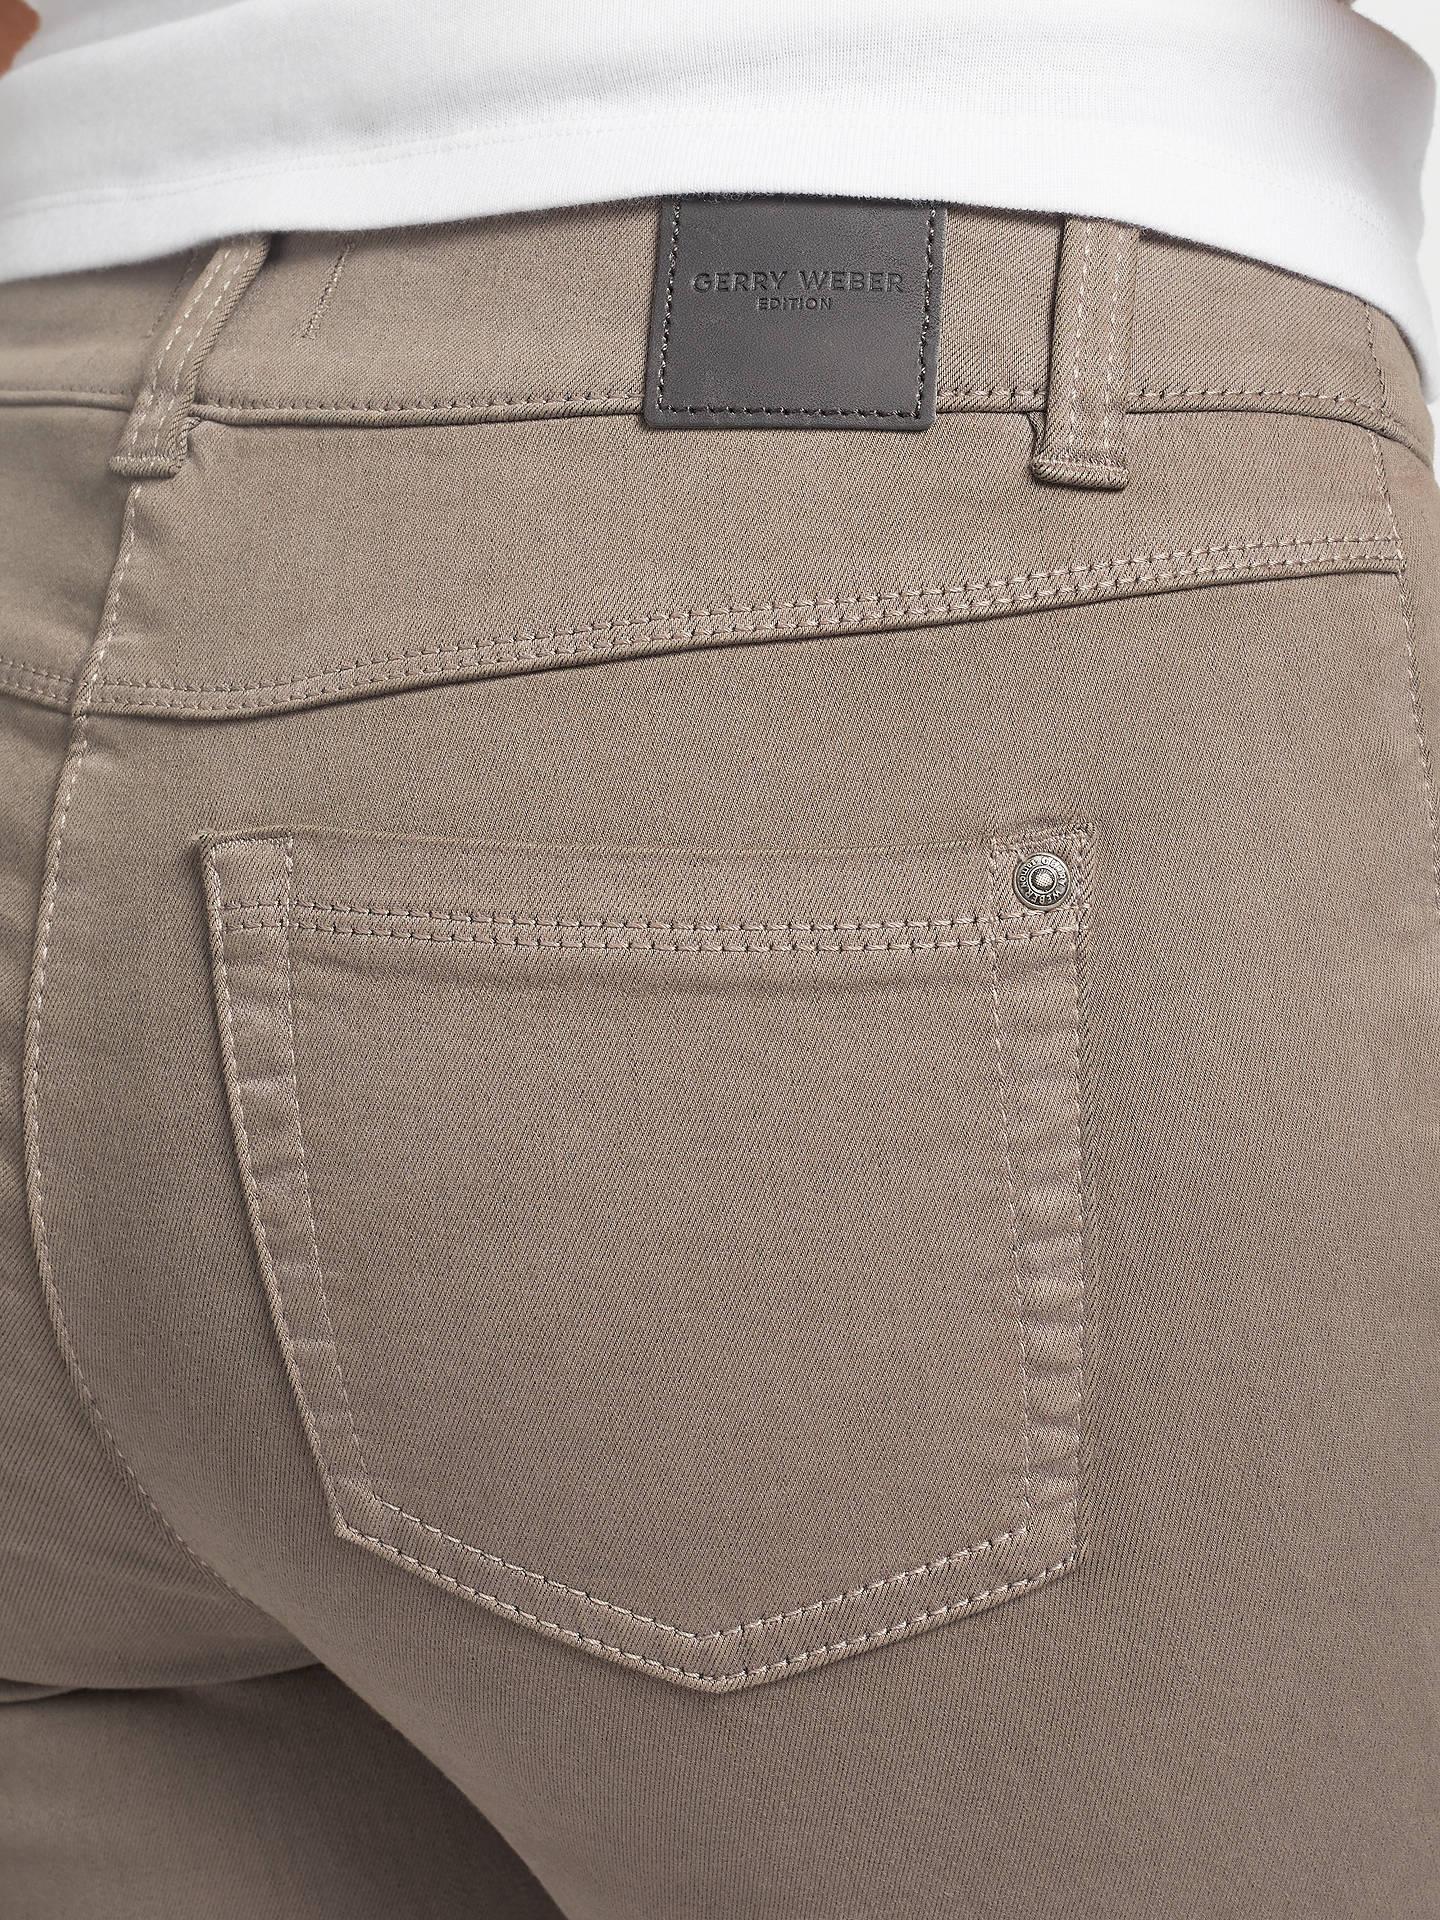 Farbbrillanz 50-70% Rabatt Großhändler Gerry Weber Roxy Perfect Fit Slim Leg Regular Length Jeans ...